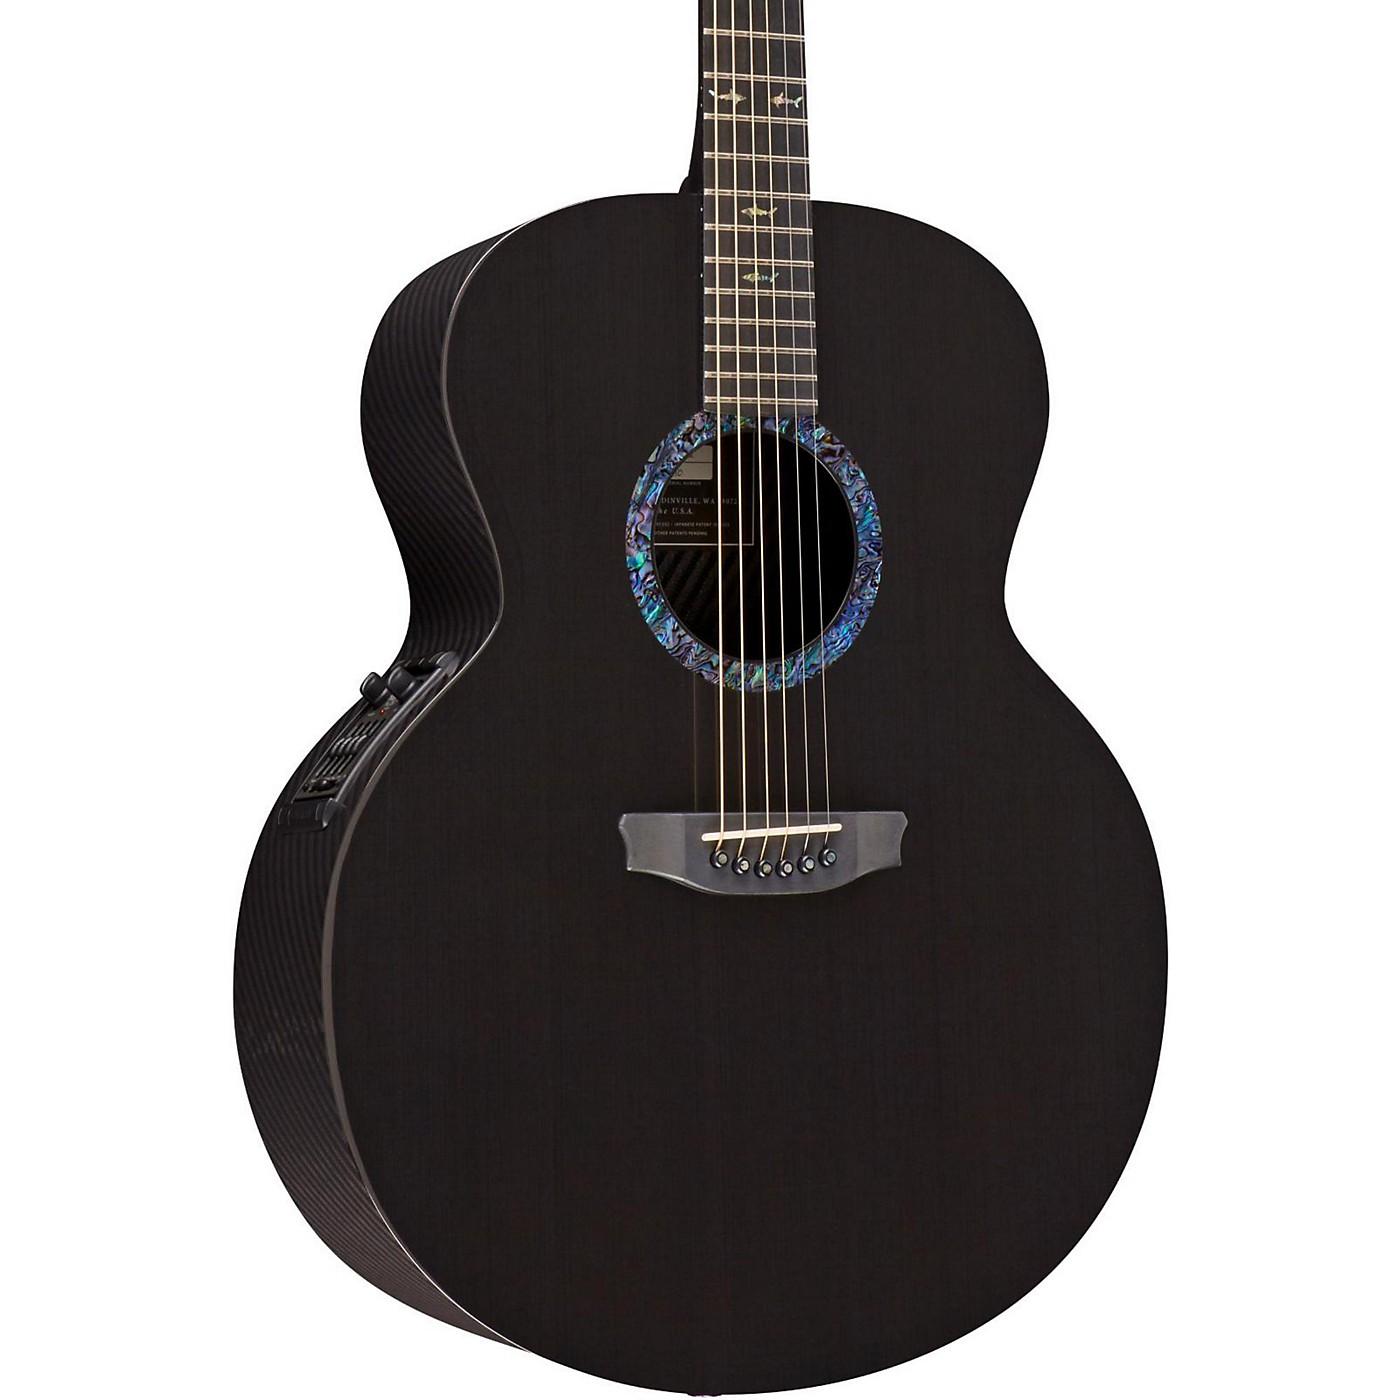 RainSong Concert Series Jumbo Acoustic-Electric Guitar thumbnail